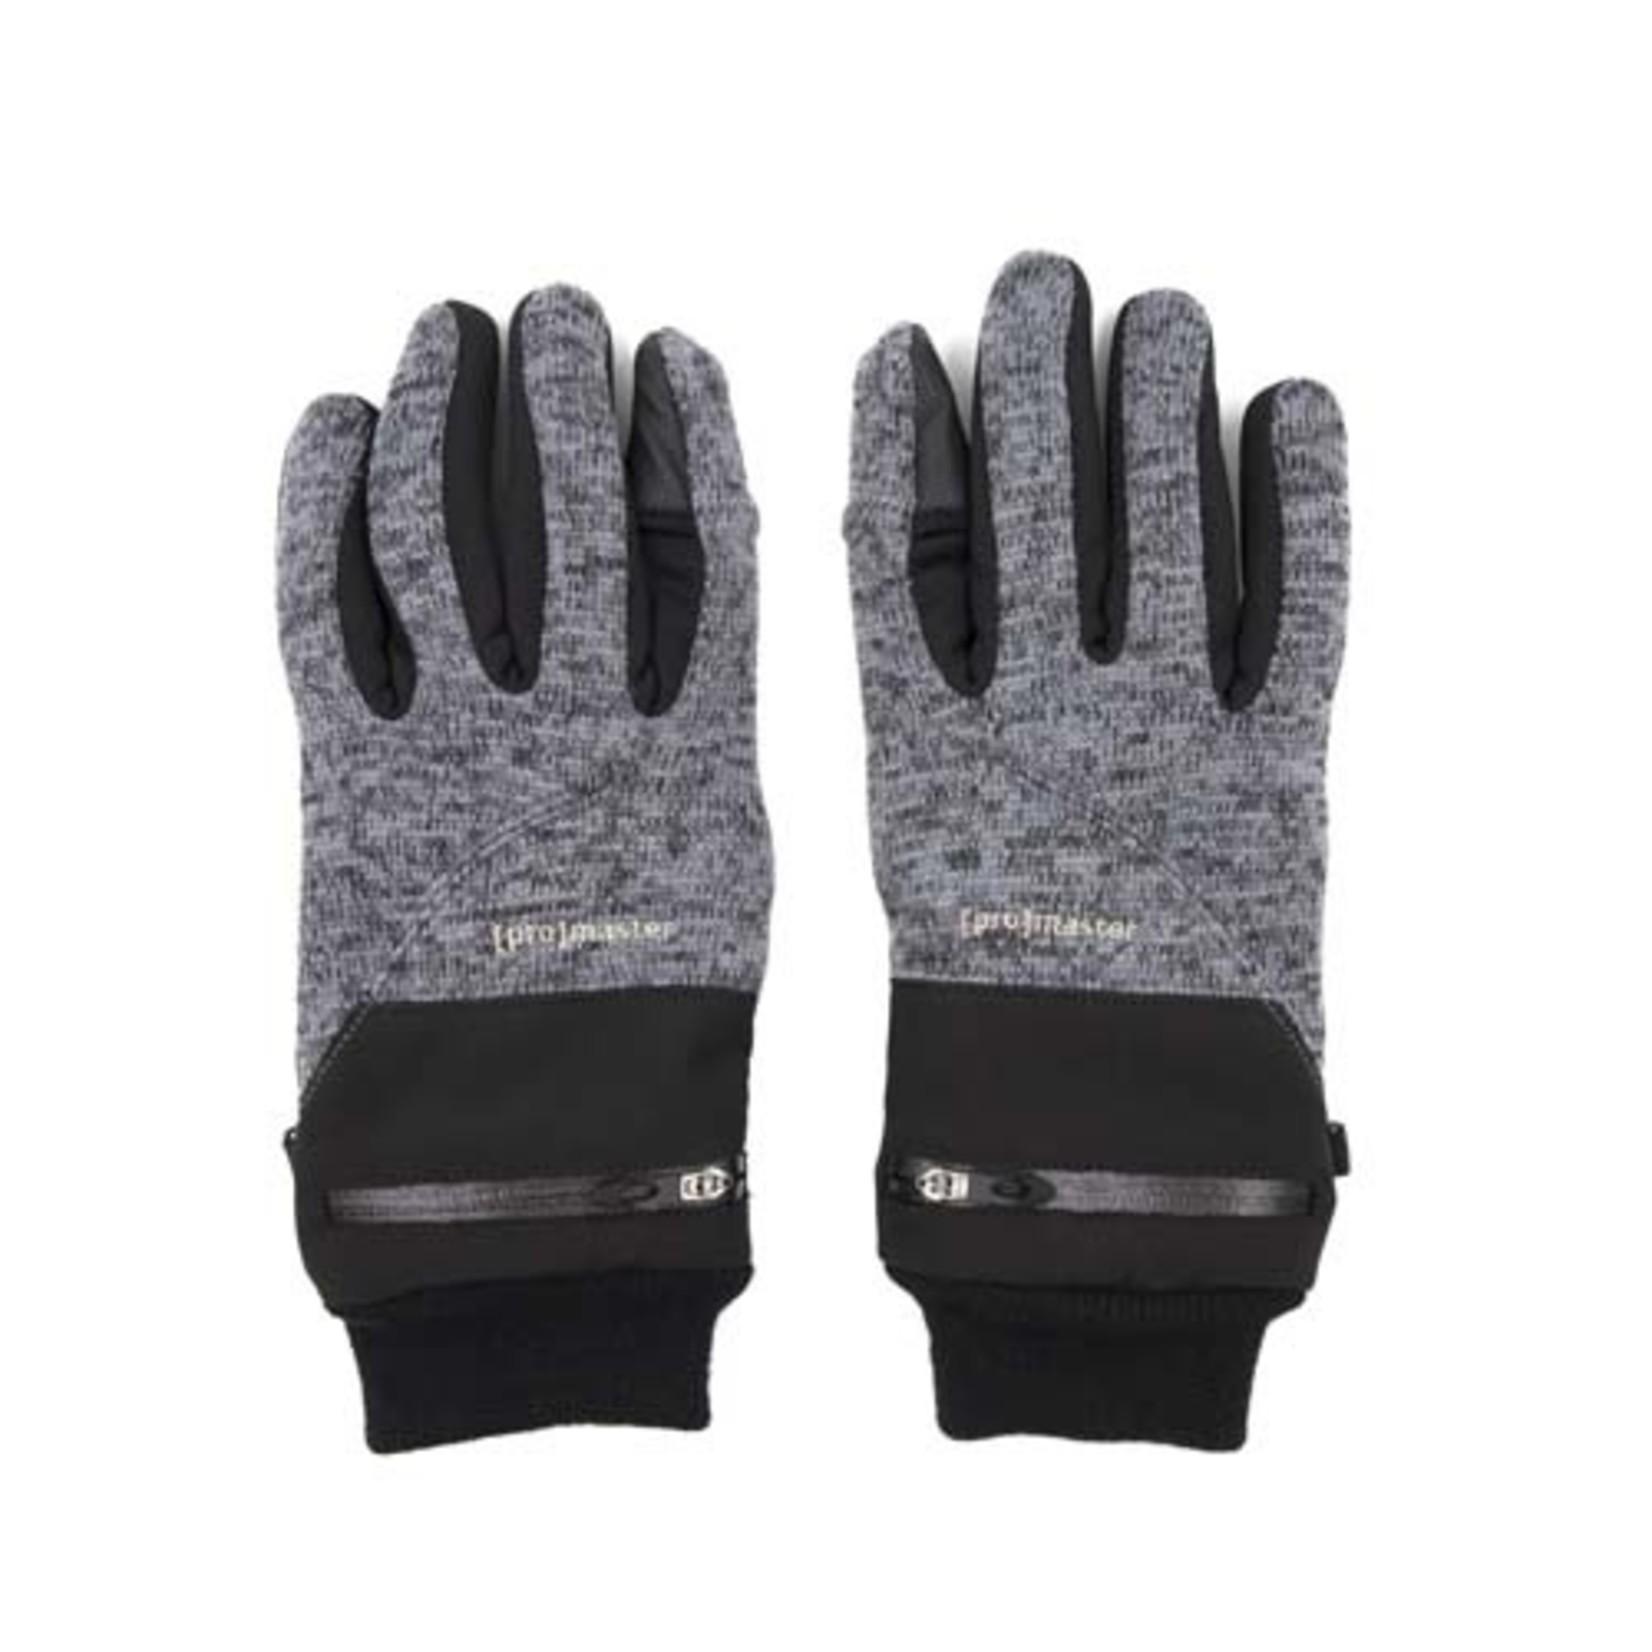 ProMaster Knit Photo Gloves - Medium v2